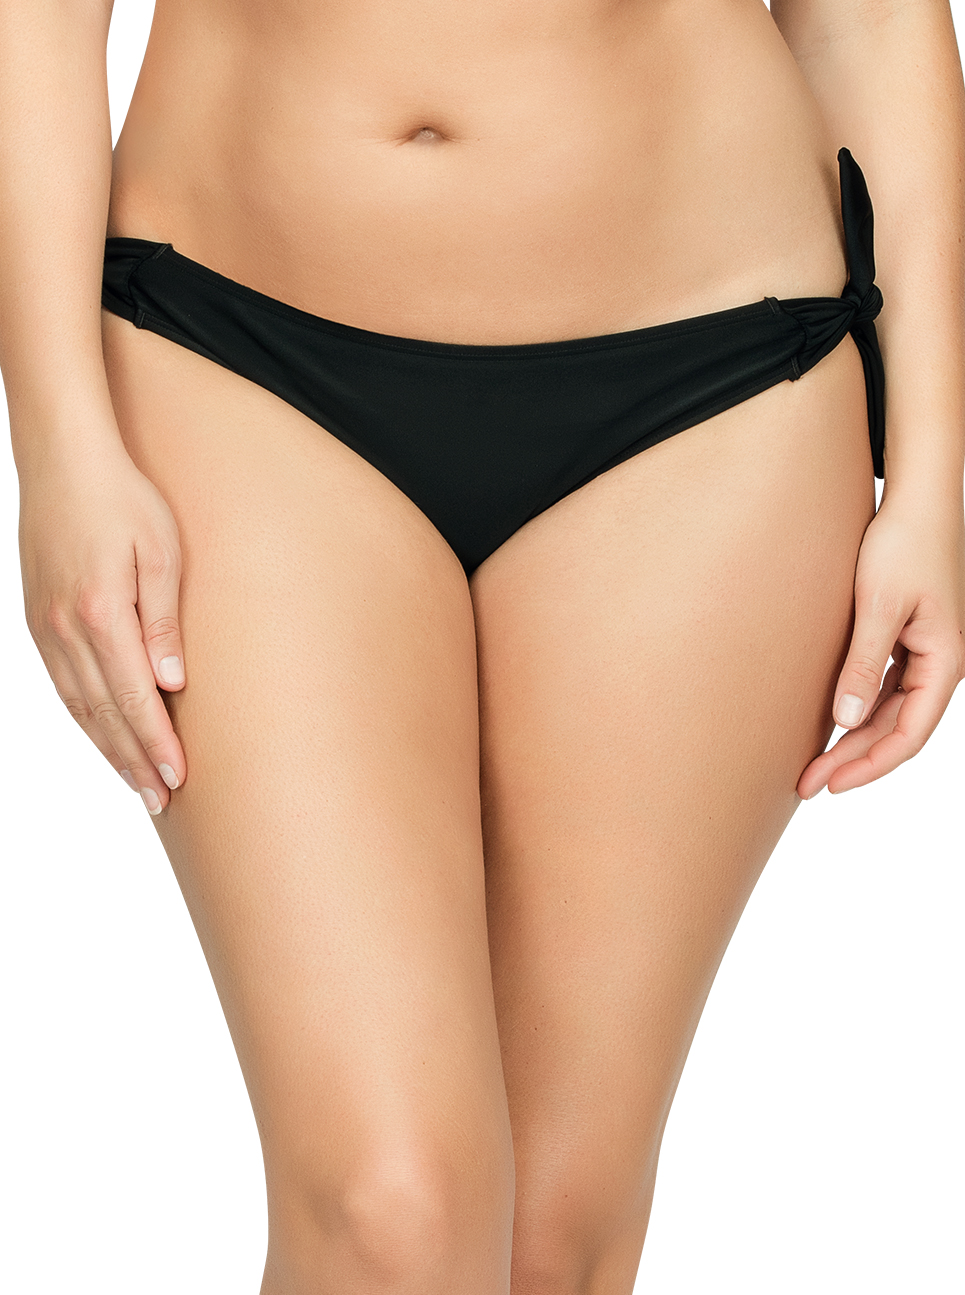 PARFAIT Oceane BikiniBottom Black Front1 - Oceane Bikini Bottom Black S8063